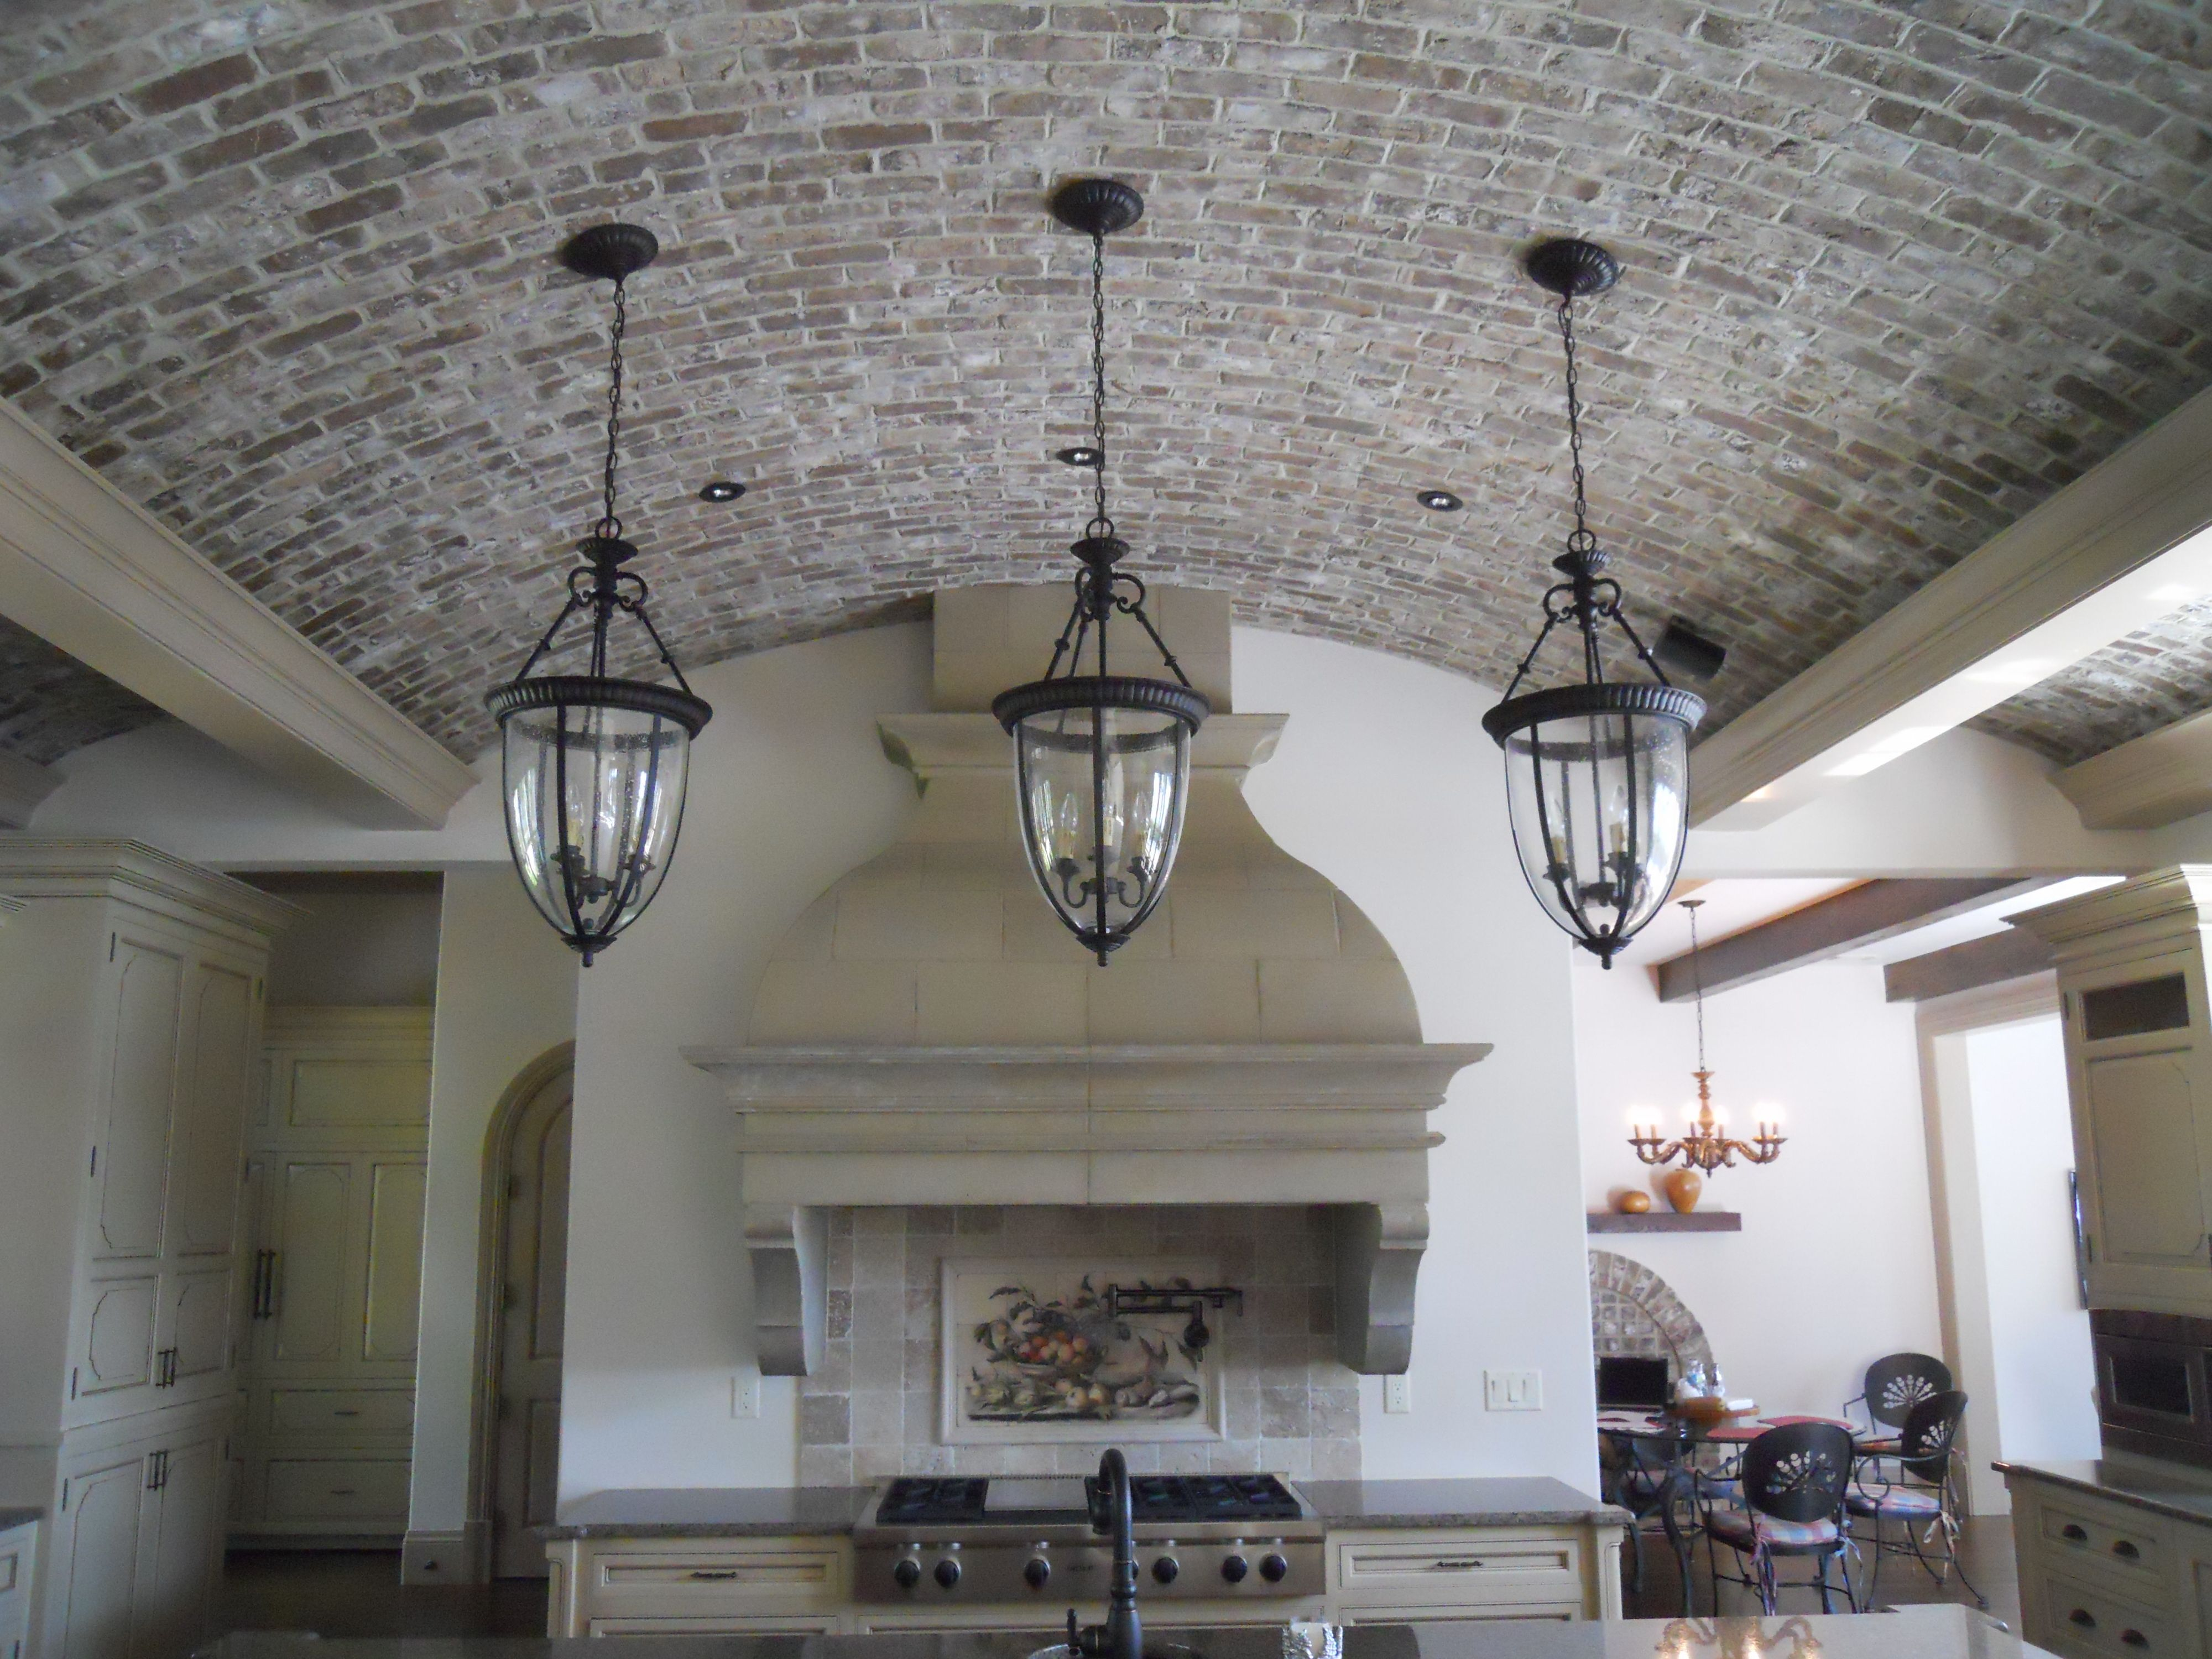 Pictures of barrel ceilings Sotz Barrel Stove Kit - m